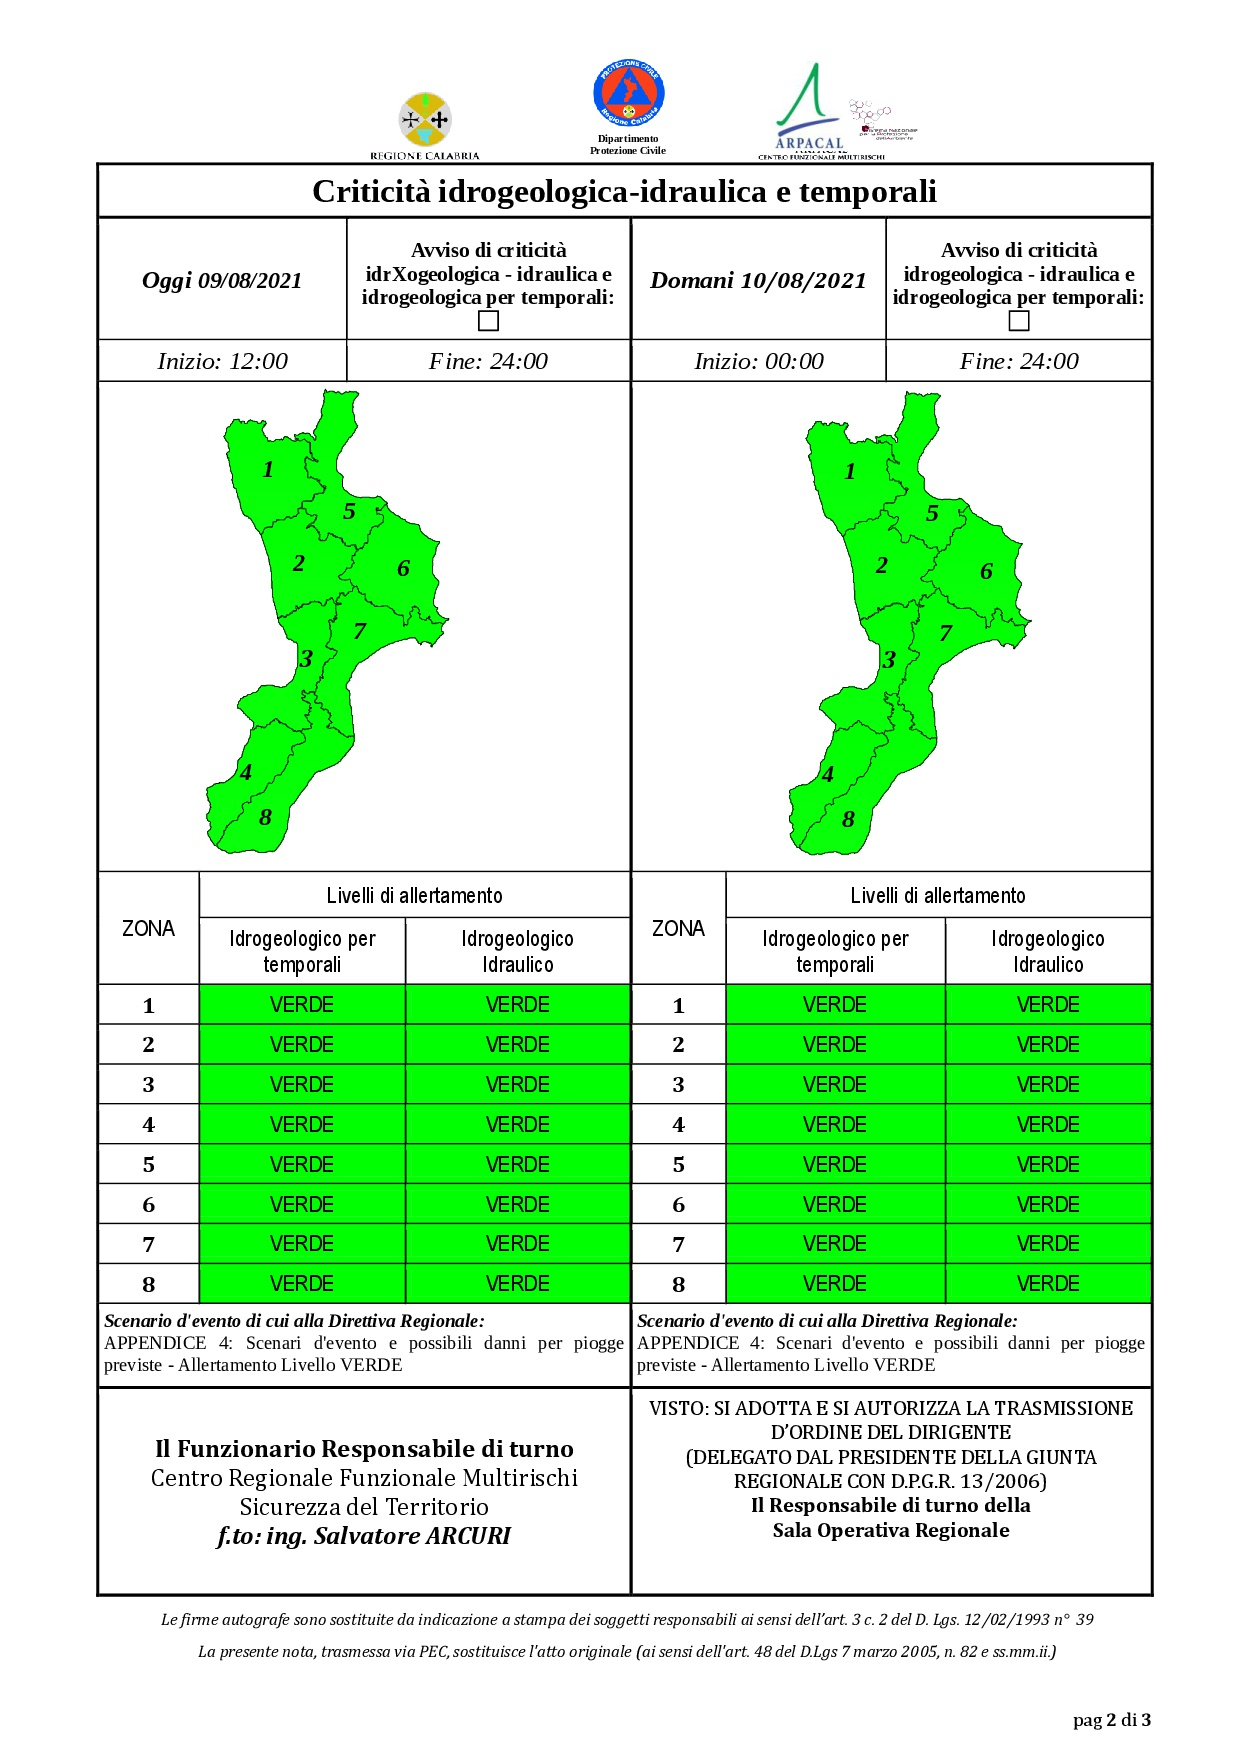 Criticità idrogeologica-idraulica e temporali in Calabria 09-08-2021